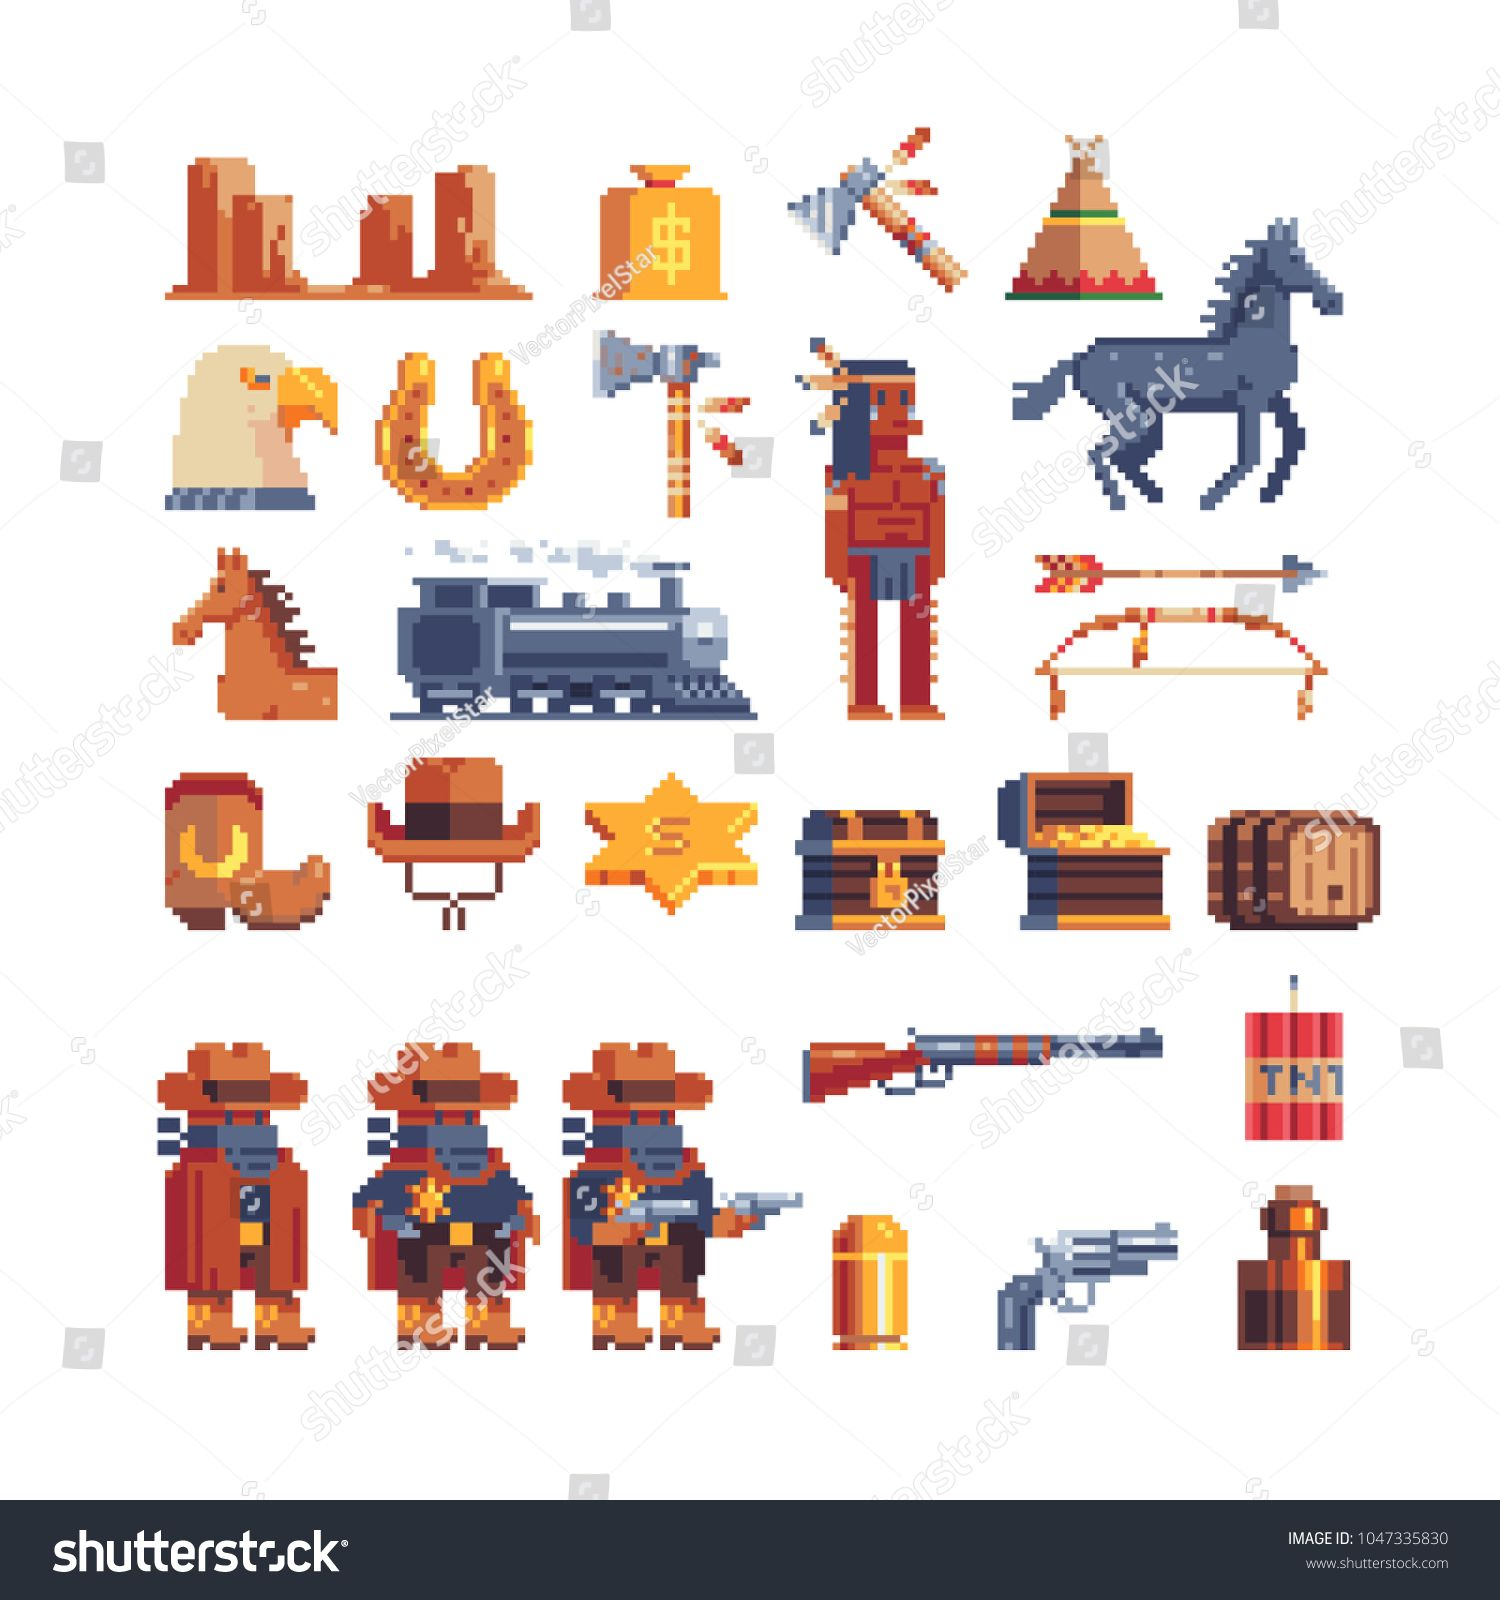 Western wild west pixel art icon. Design for mobile app